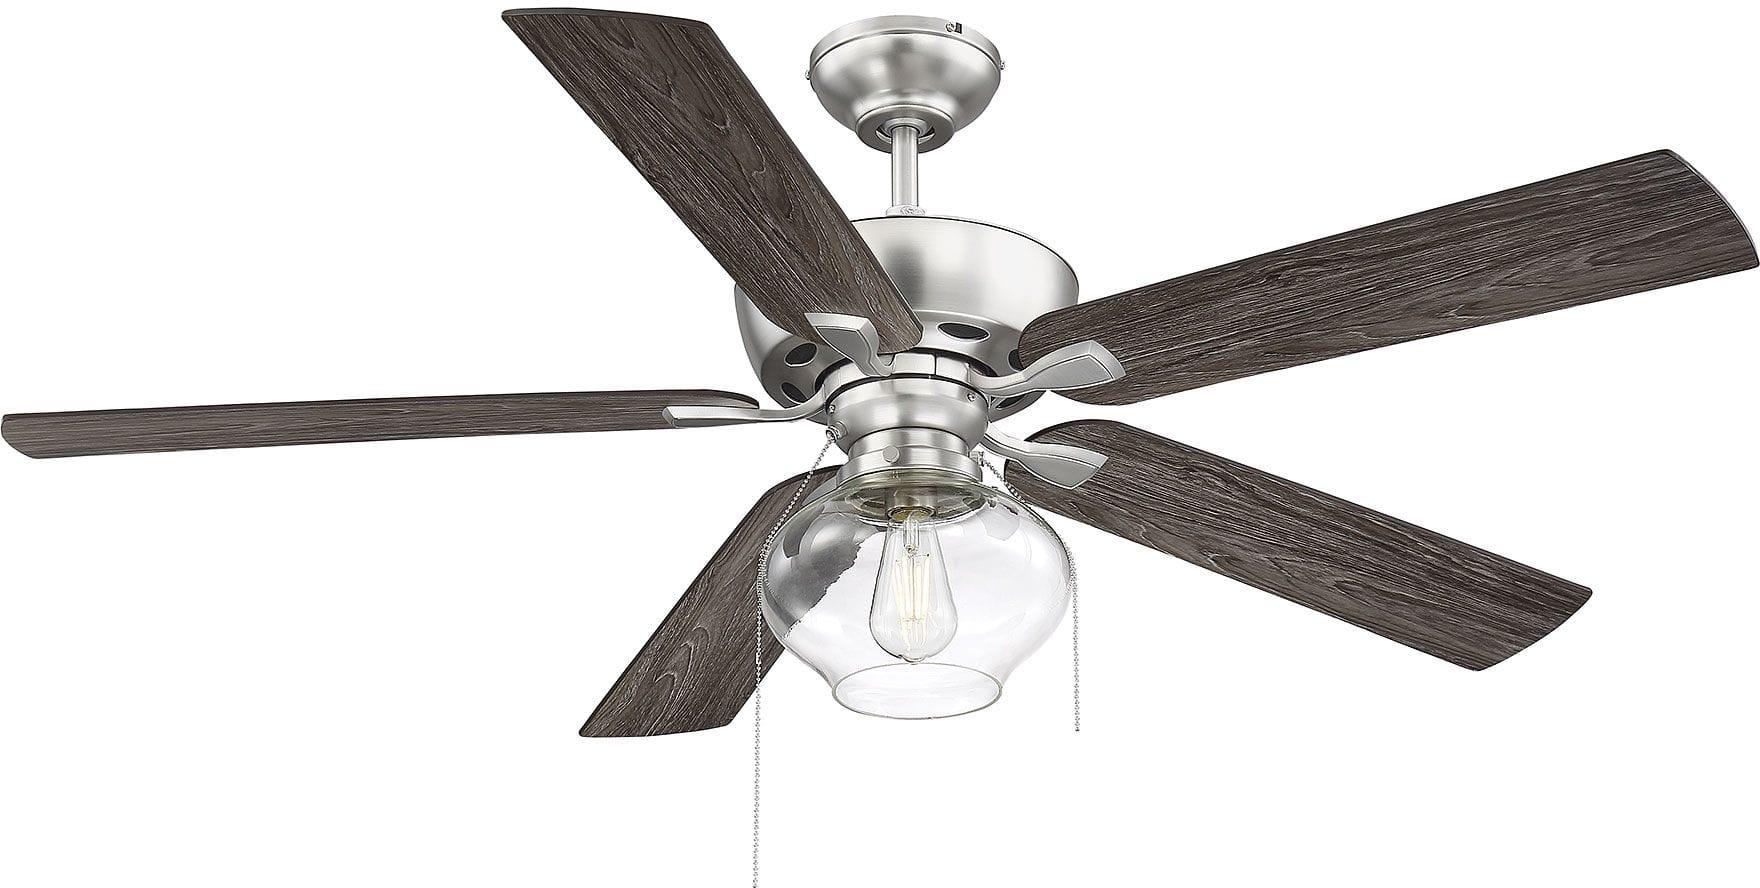 Bellevue Shm2009bn Brushed Nickel 52 5 Blade Dual Mounting Ceiling Fan Lightingshowplace Com